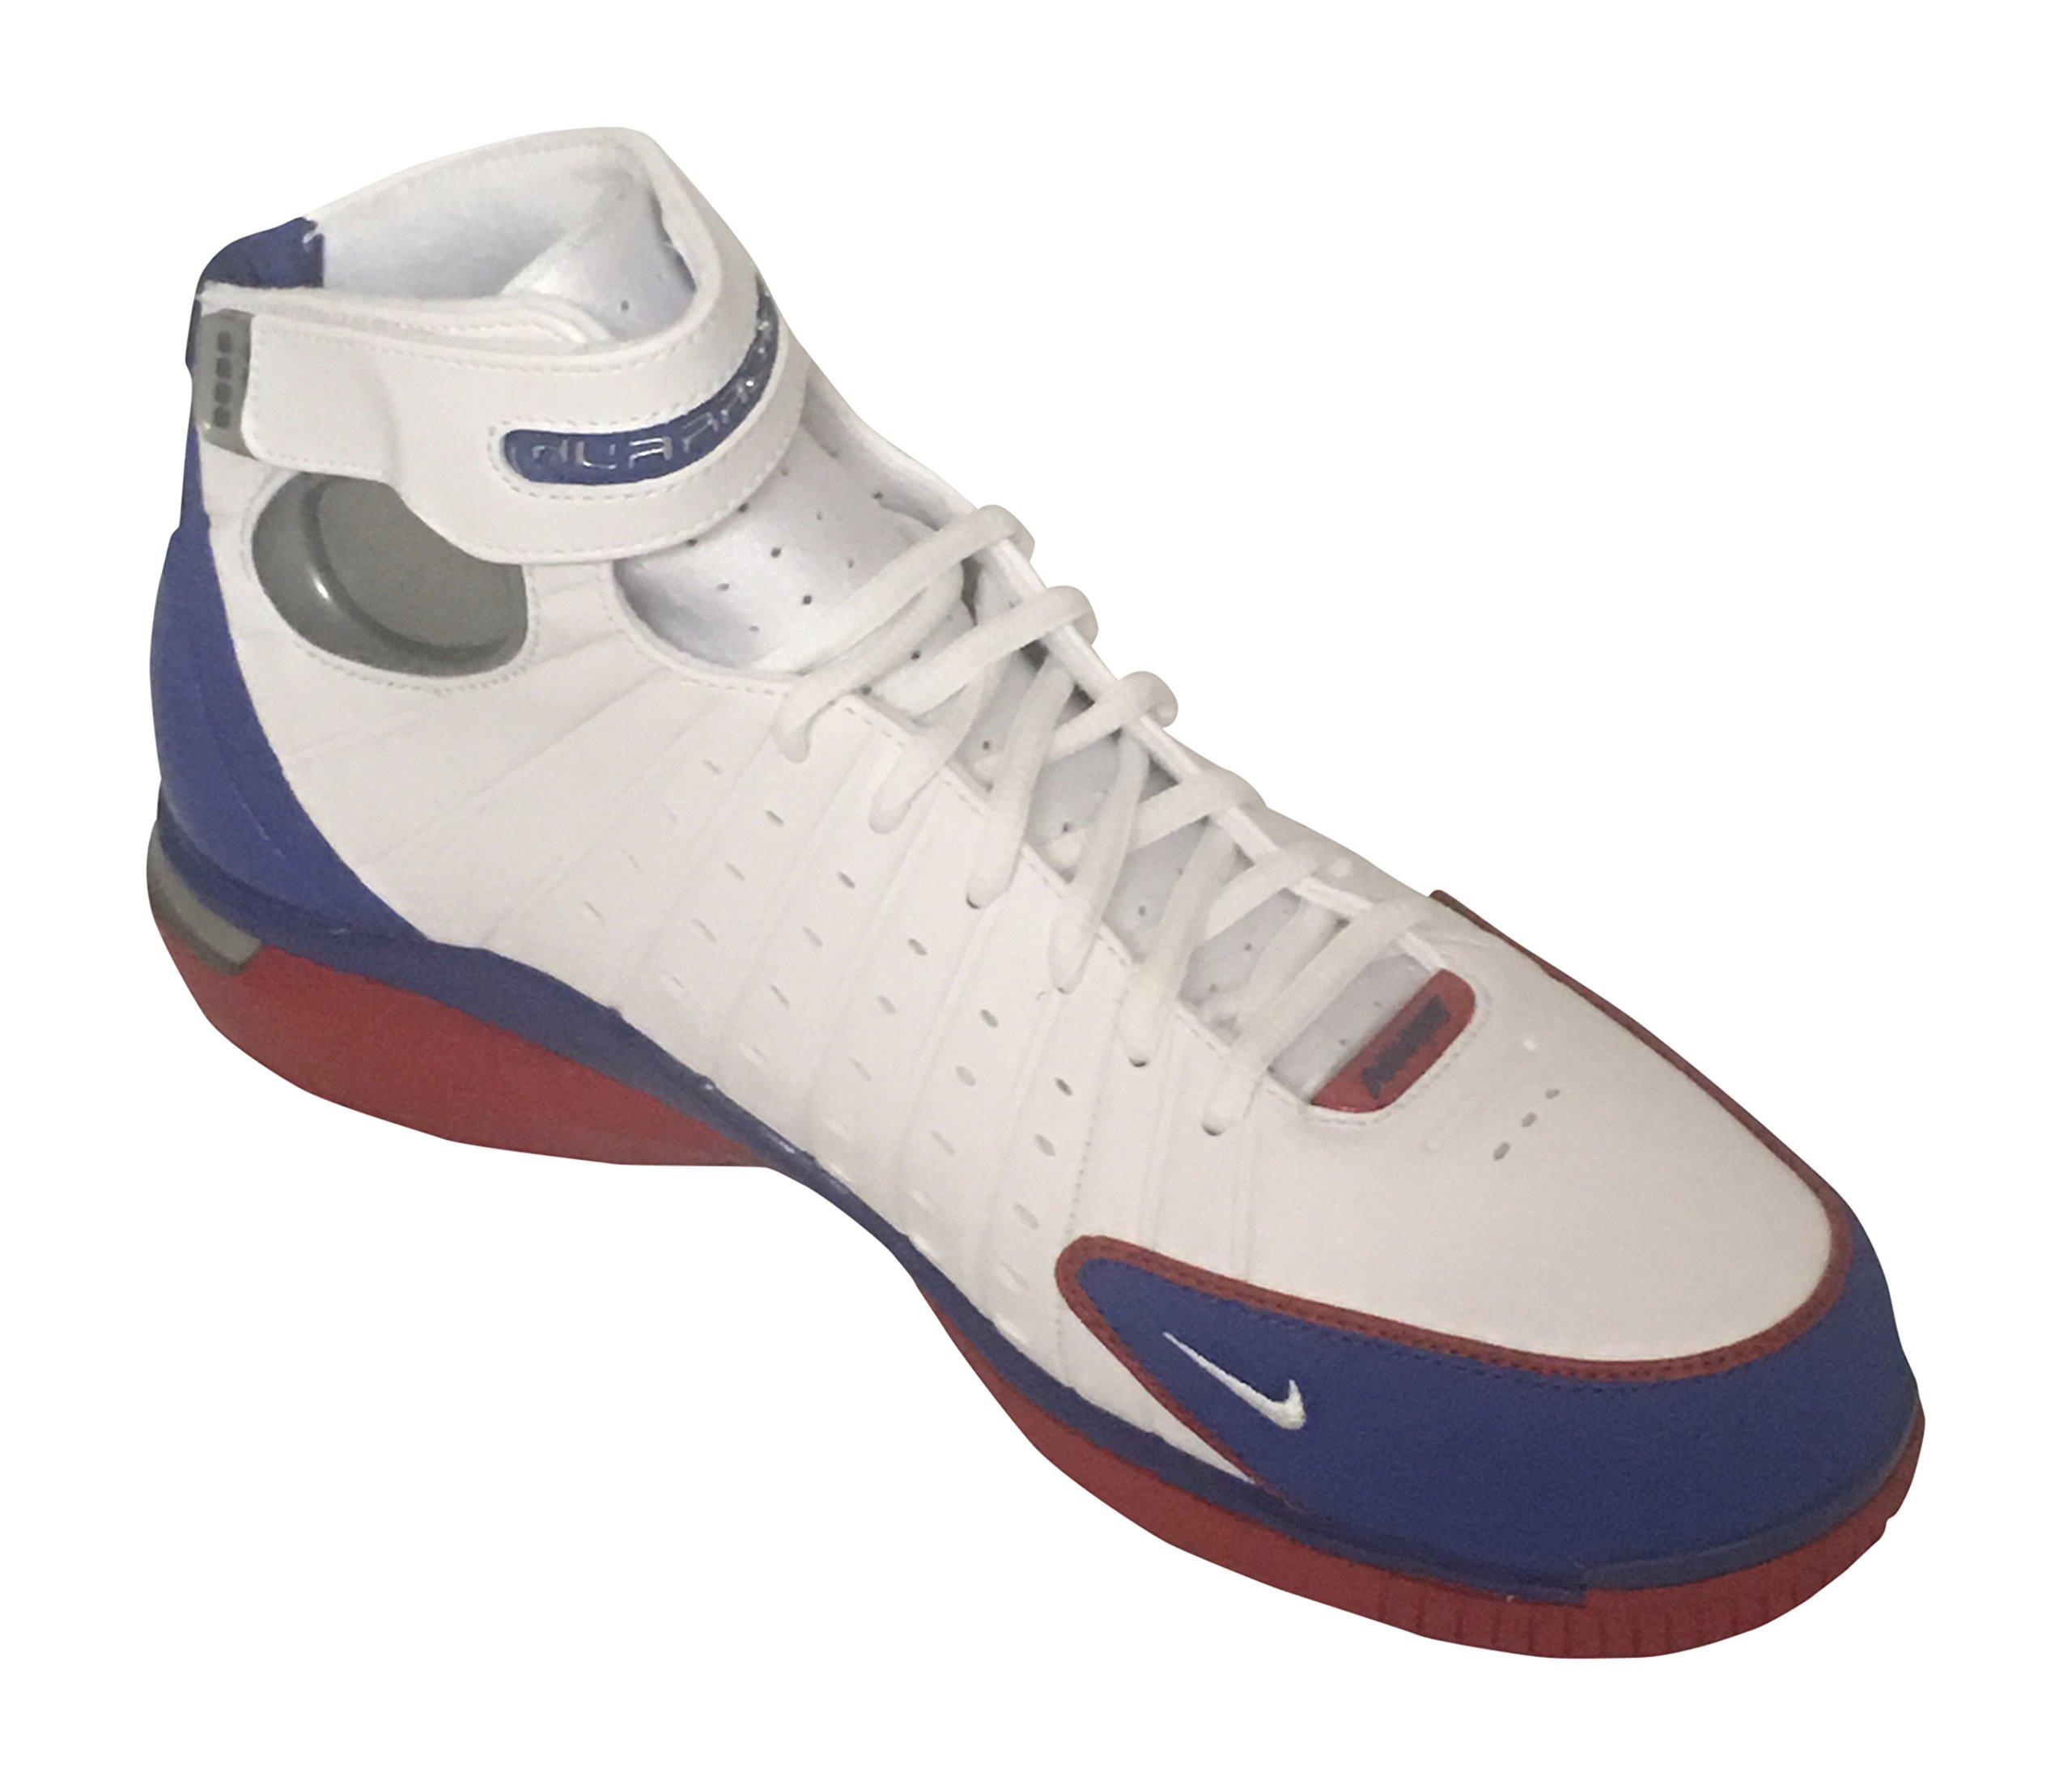 sale retailer 100c0 5820f Galleon - Nike Men s Air Zoom Huarache 2K4 White Red Metalic Silver 308475- 100 (SIZE  11)